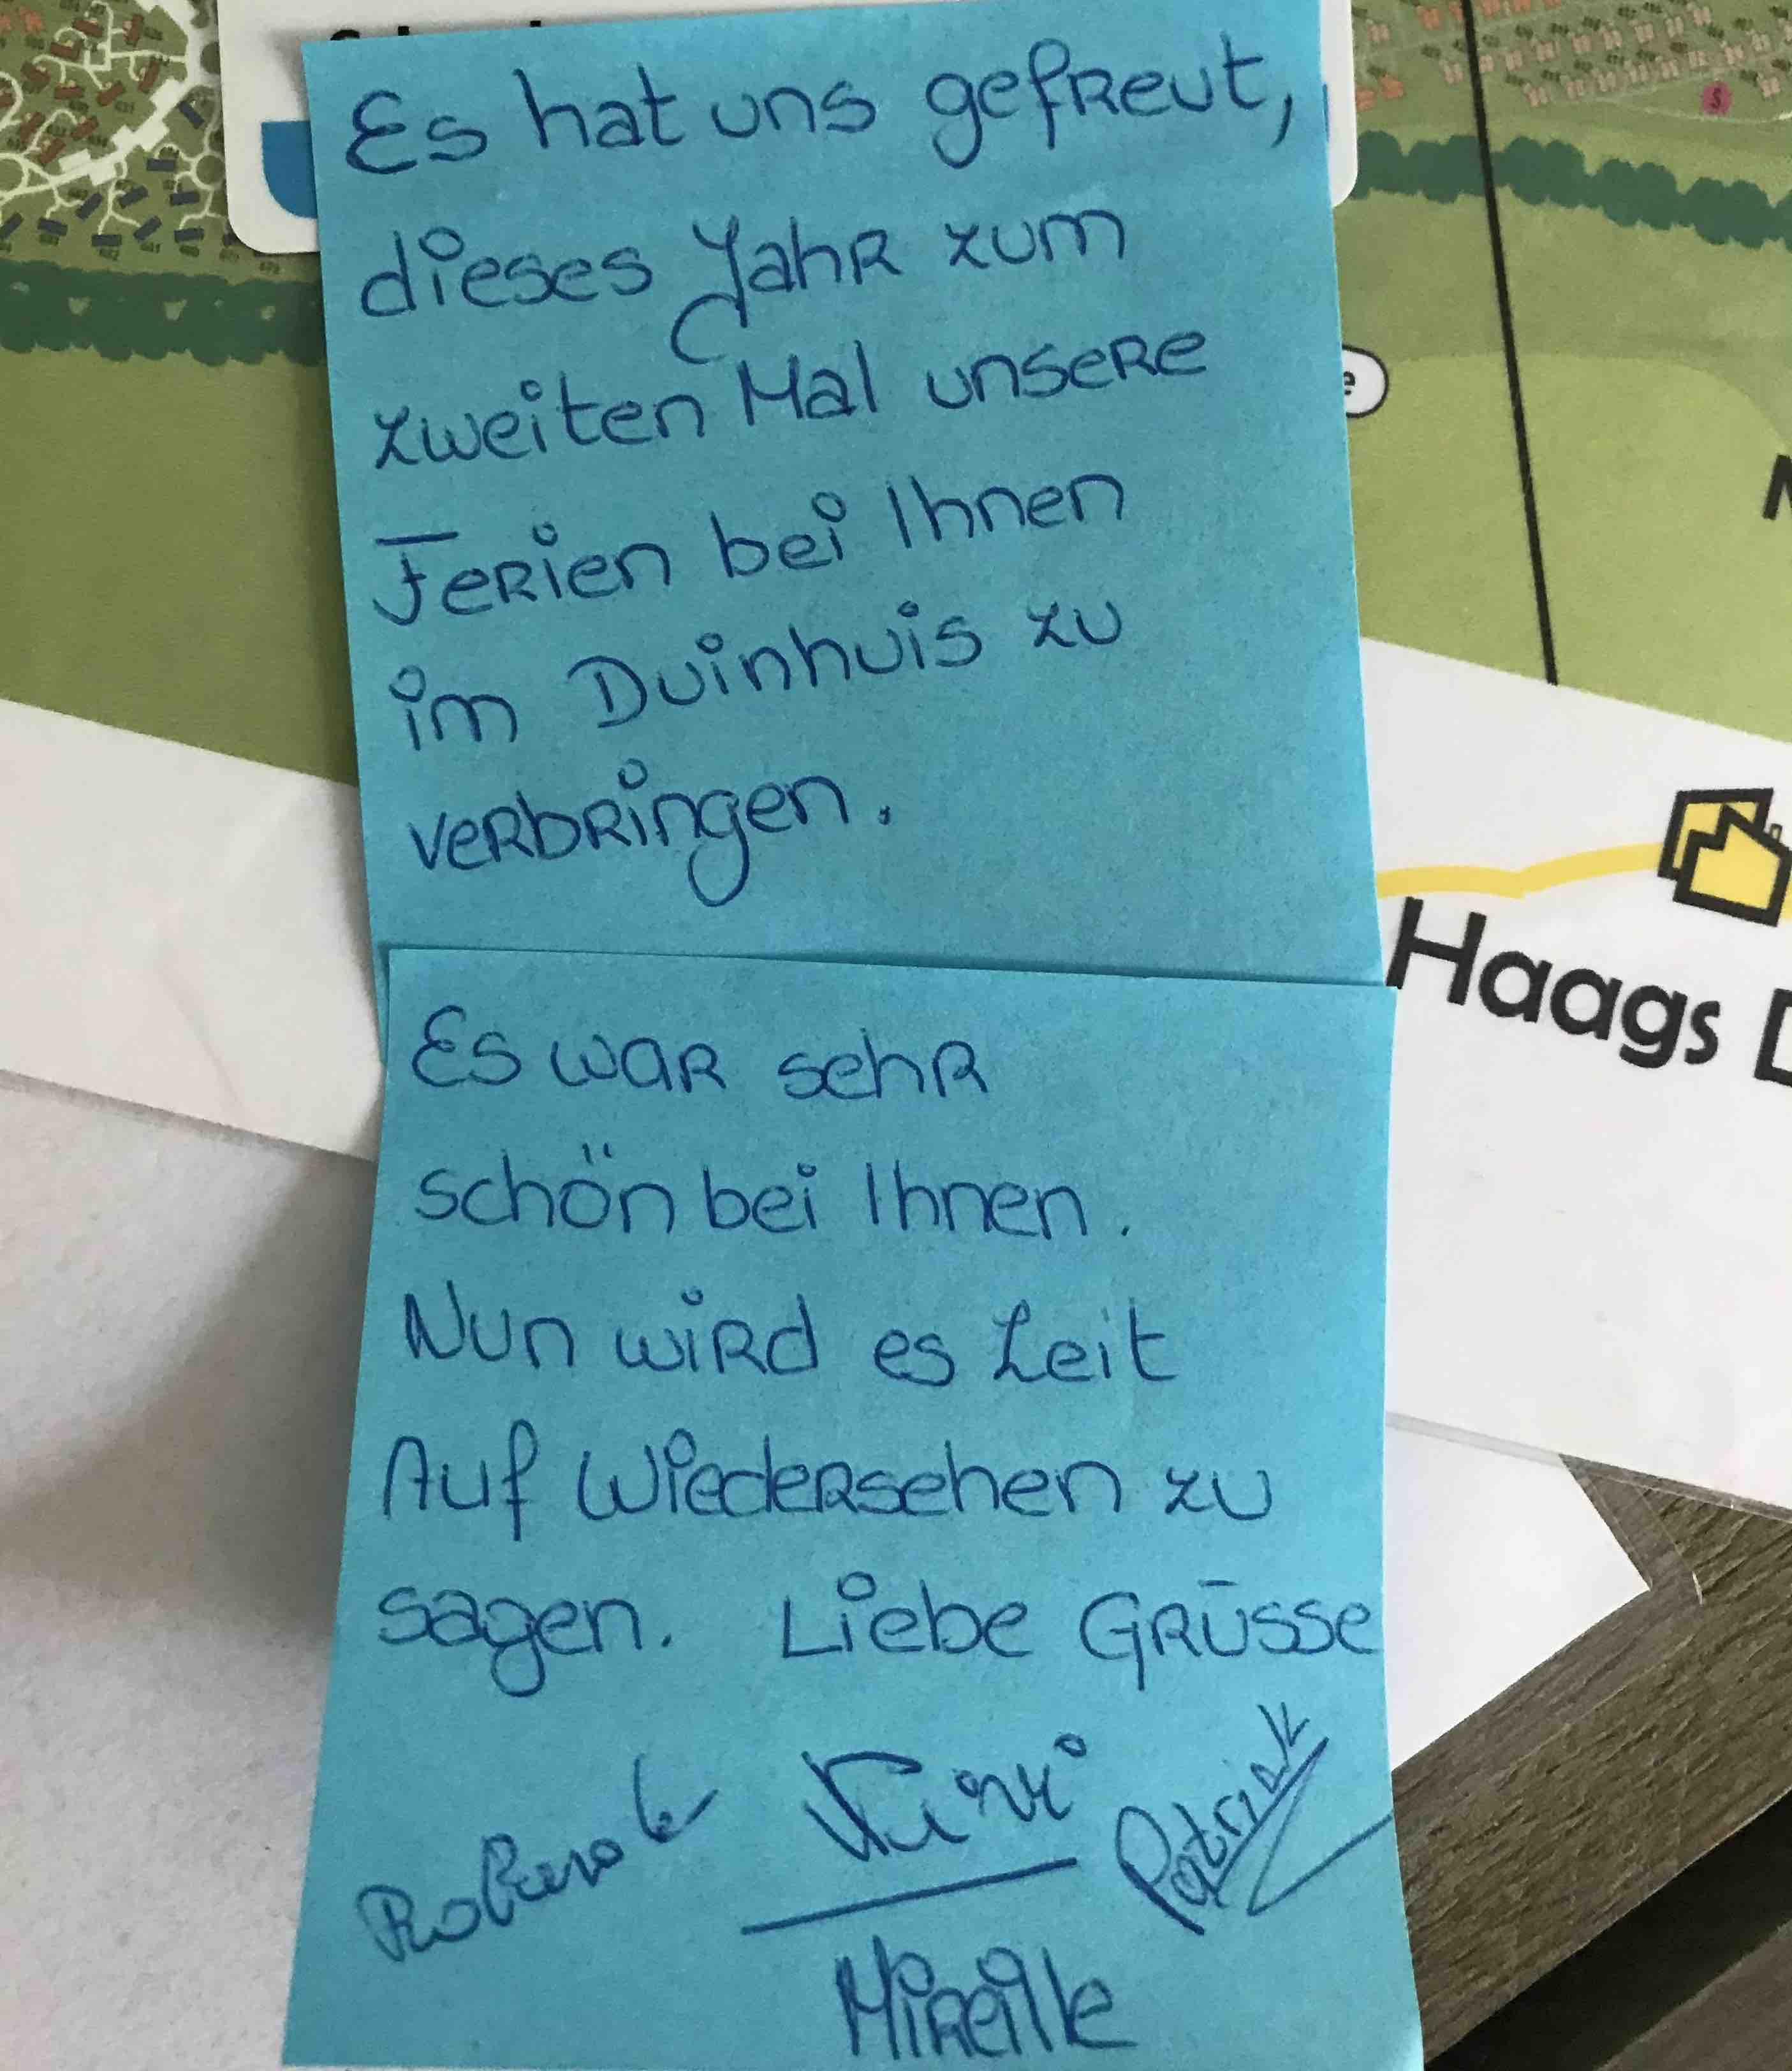 Bewertung HaagsDuinhuis